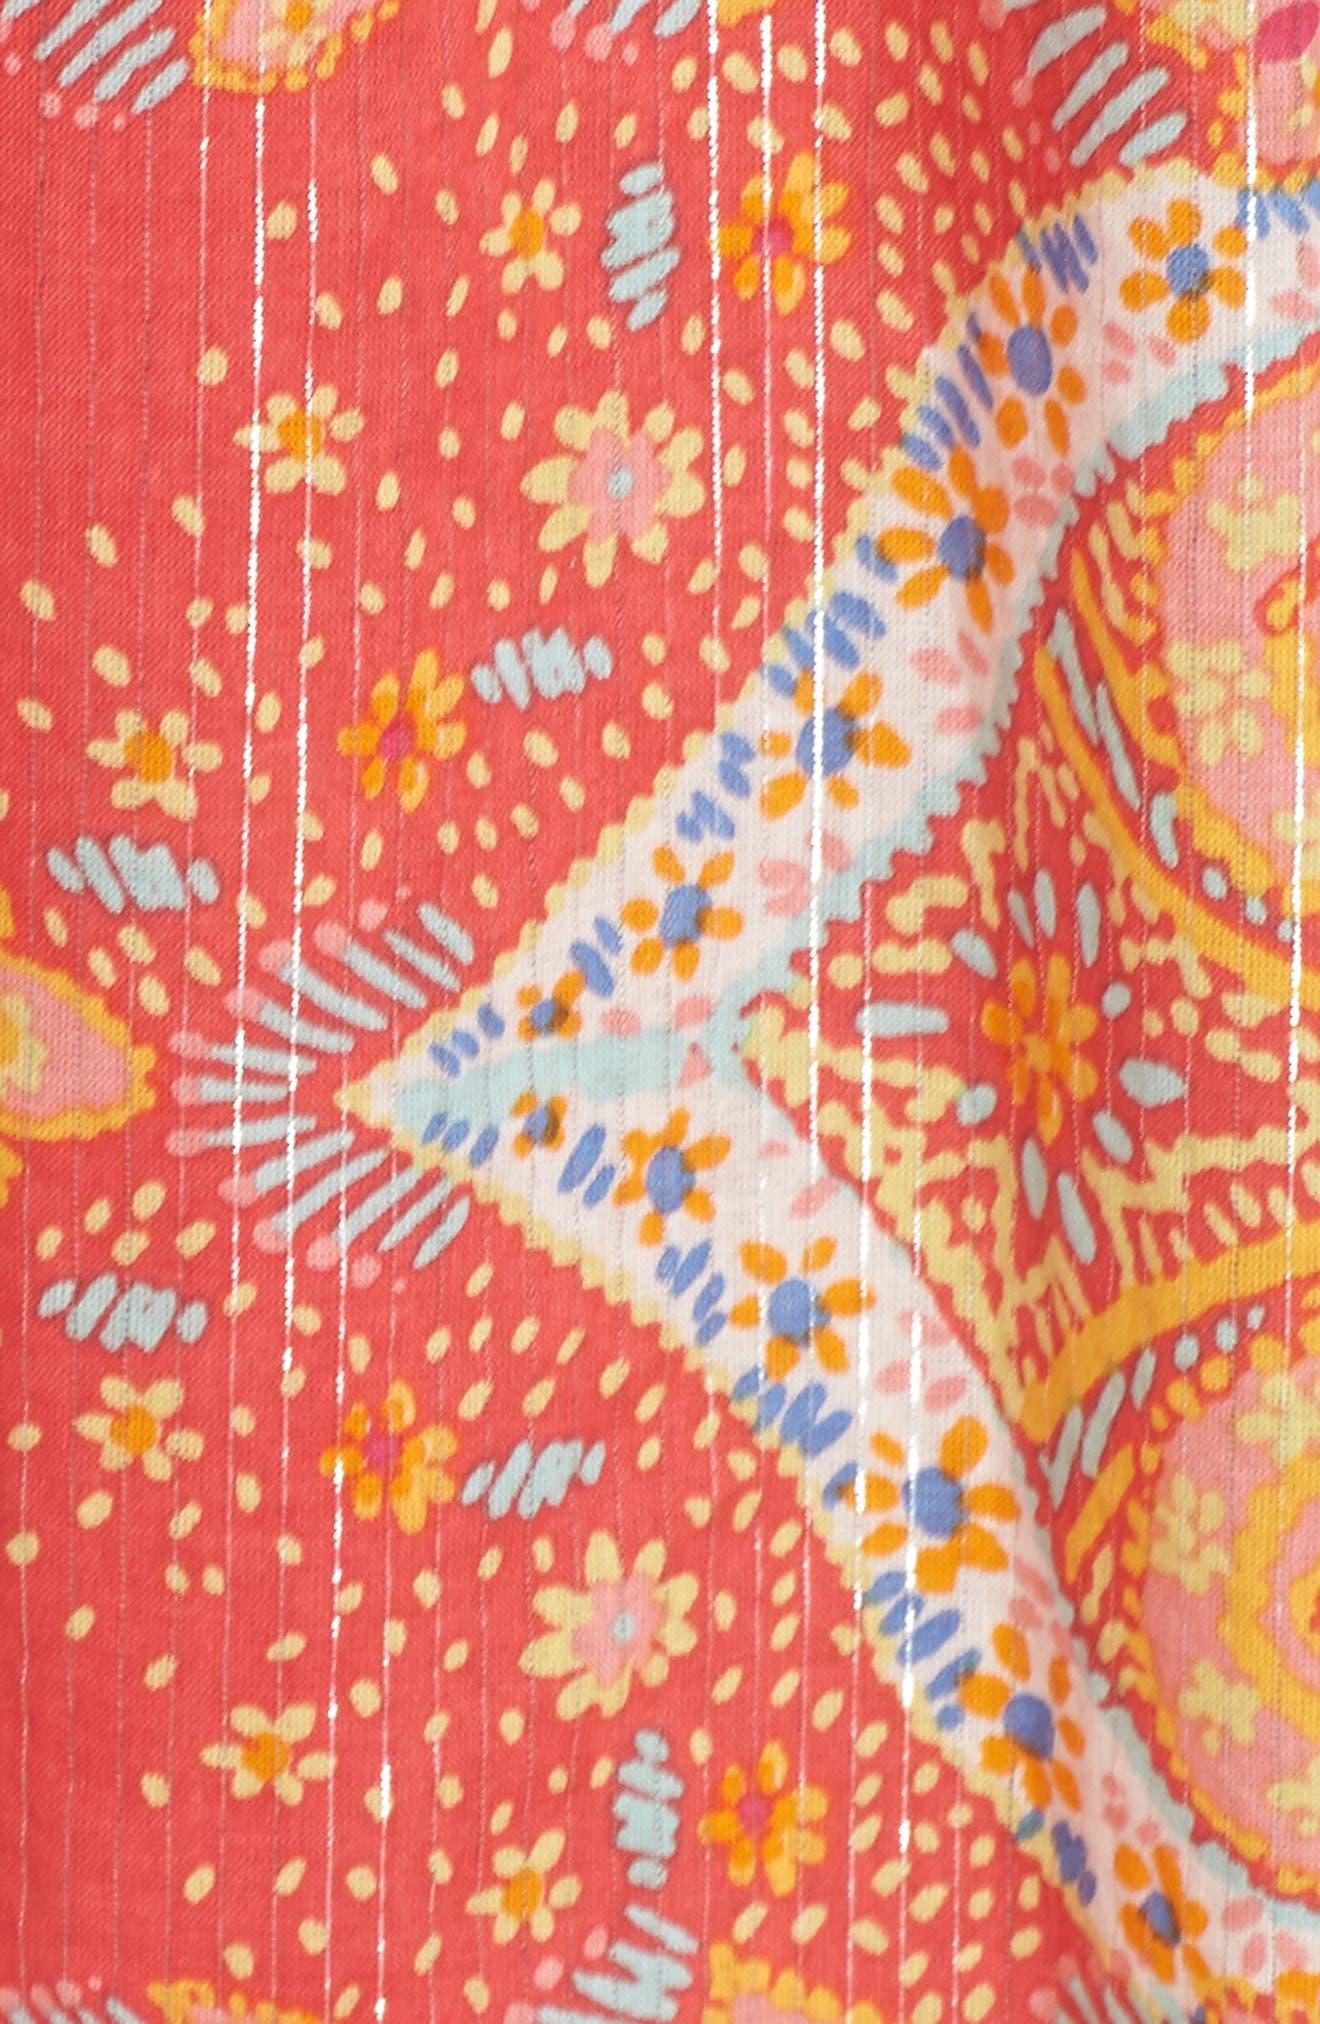 Sea Fan Paisley Cover-Up Caftan,                             Alternate thumbnail 5, color,                             Hibiscus